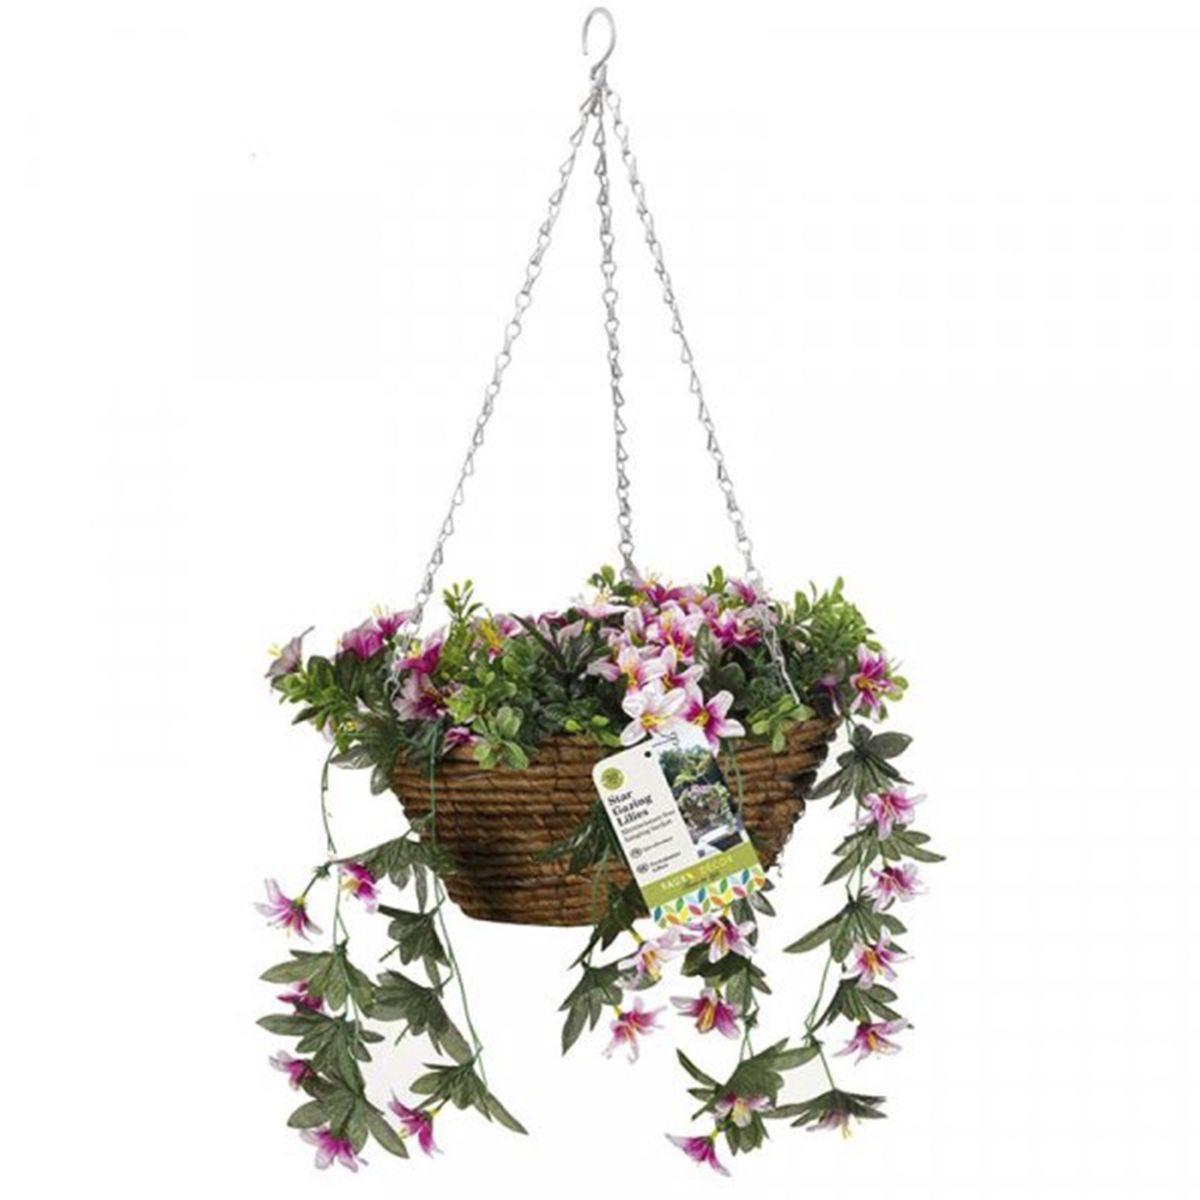 Smart Garden Star Gazing Lilles Hanging Basket